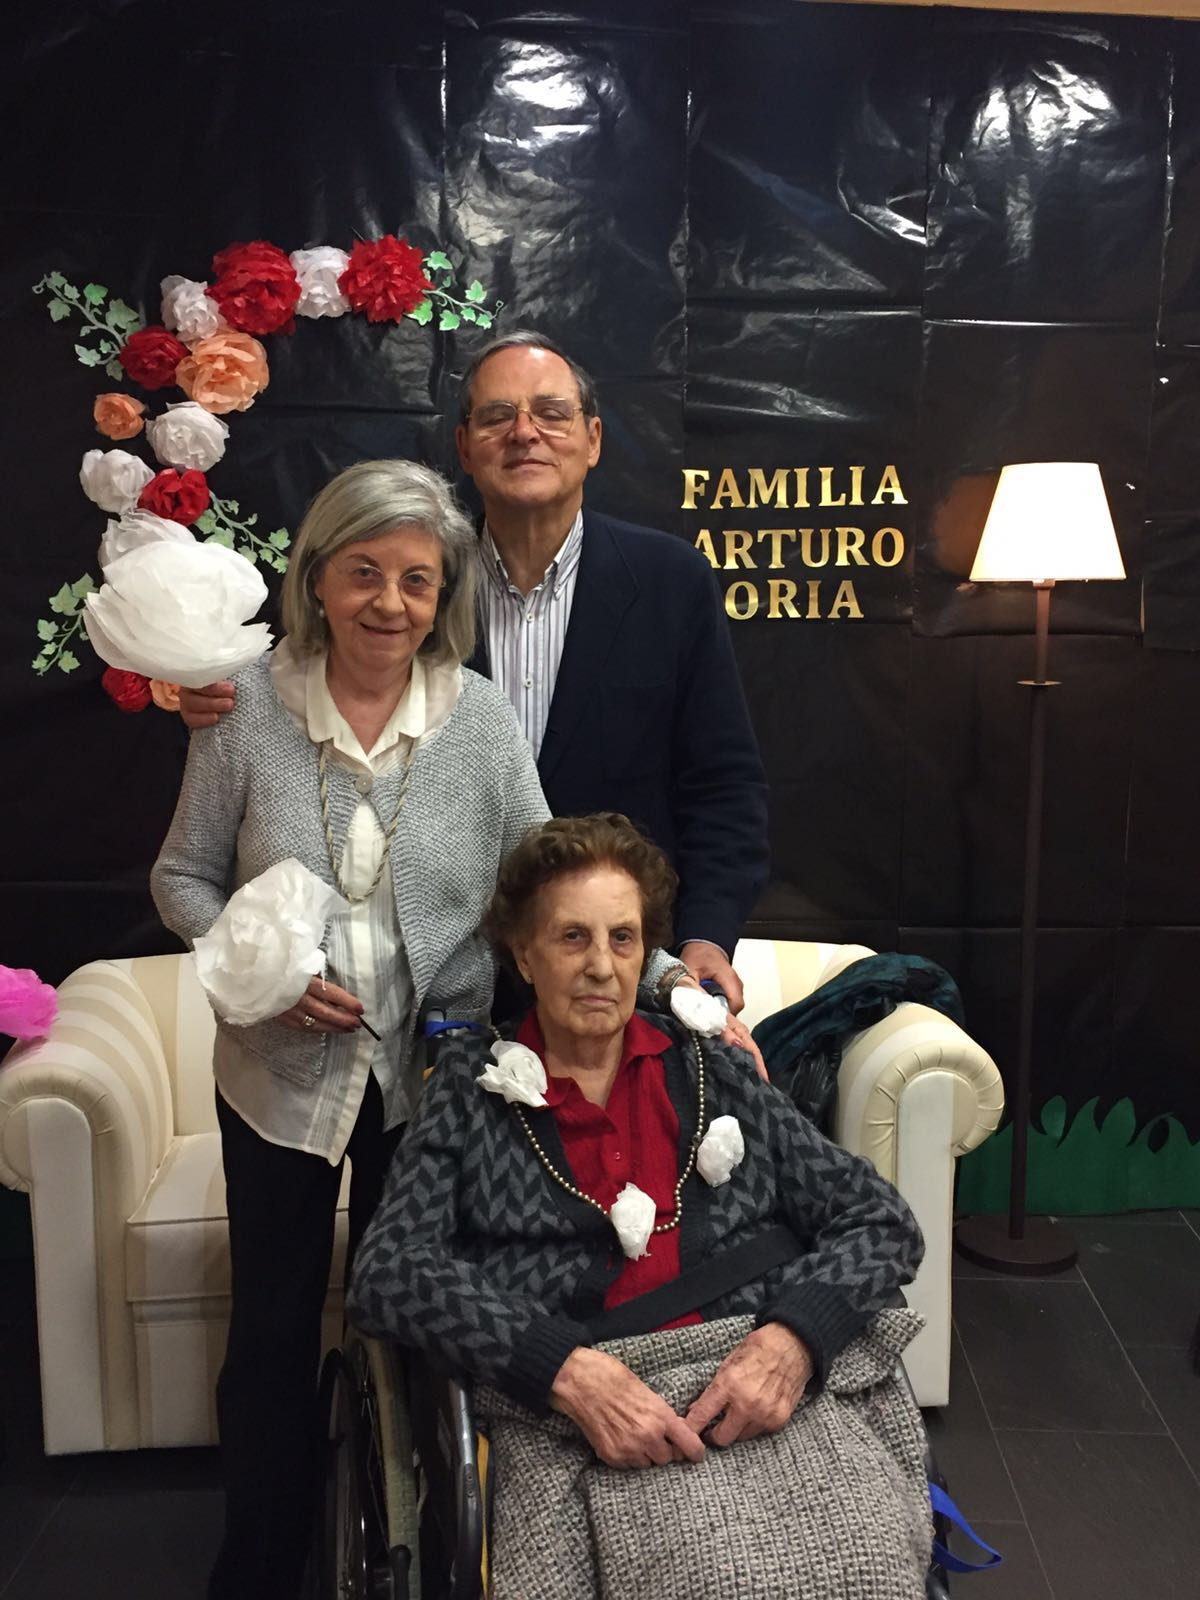 Arturo Soria Dia Familia6